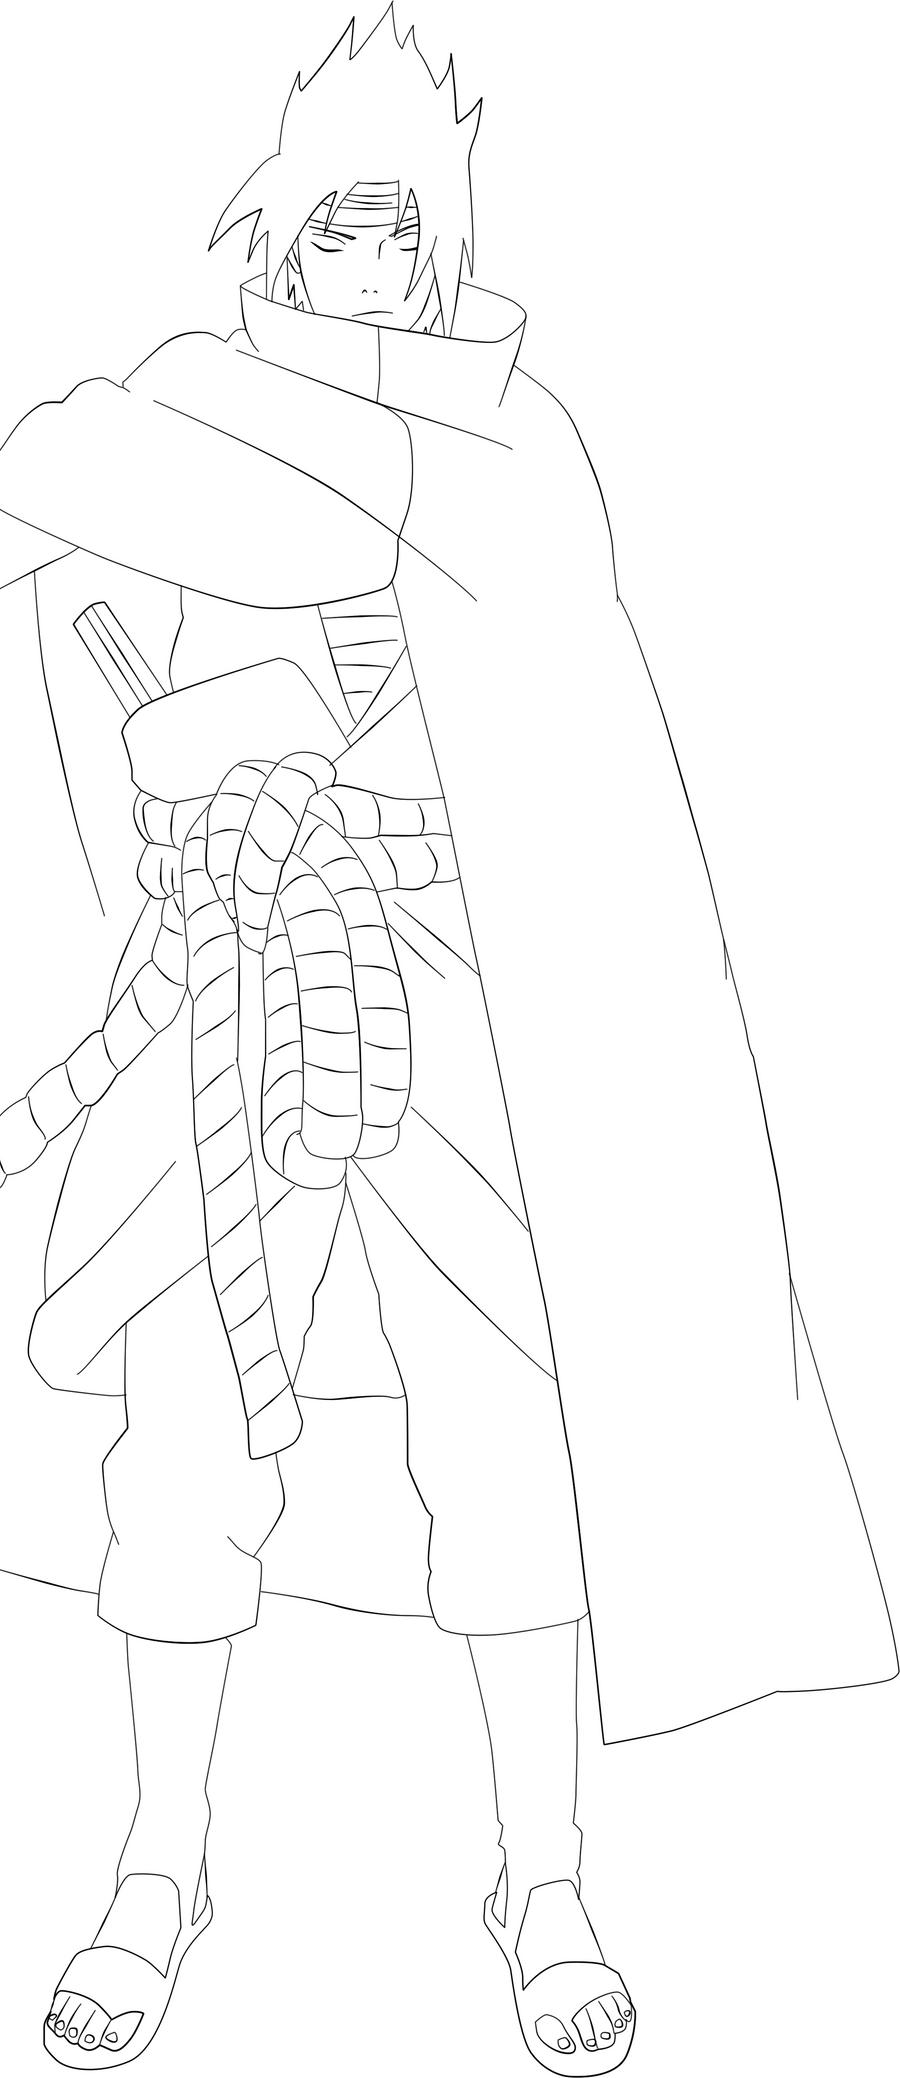 Sasuke Lineart : Sasuke lineart by areszxx on deviantart